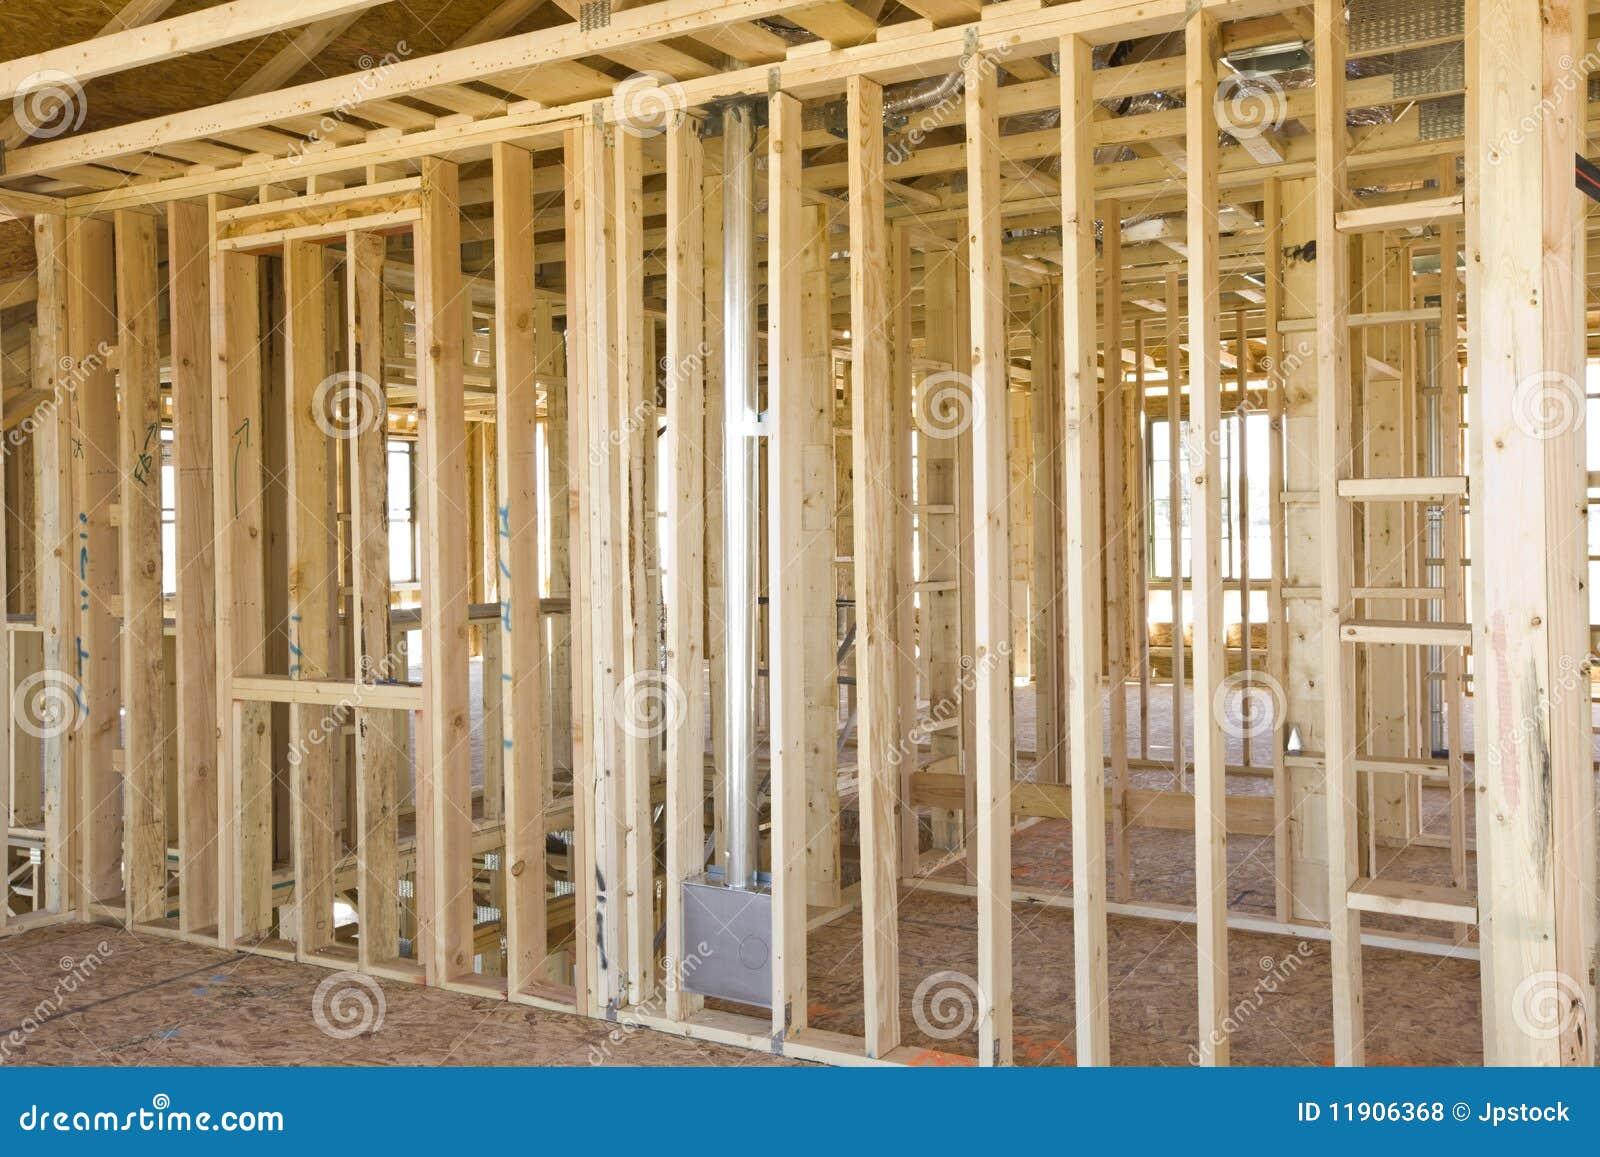 Interior Building Construction : Interior construction framing stock photo image of